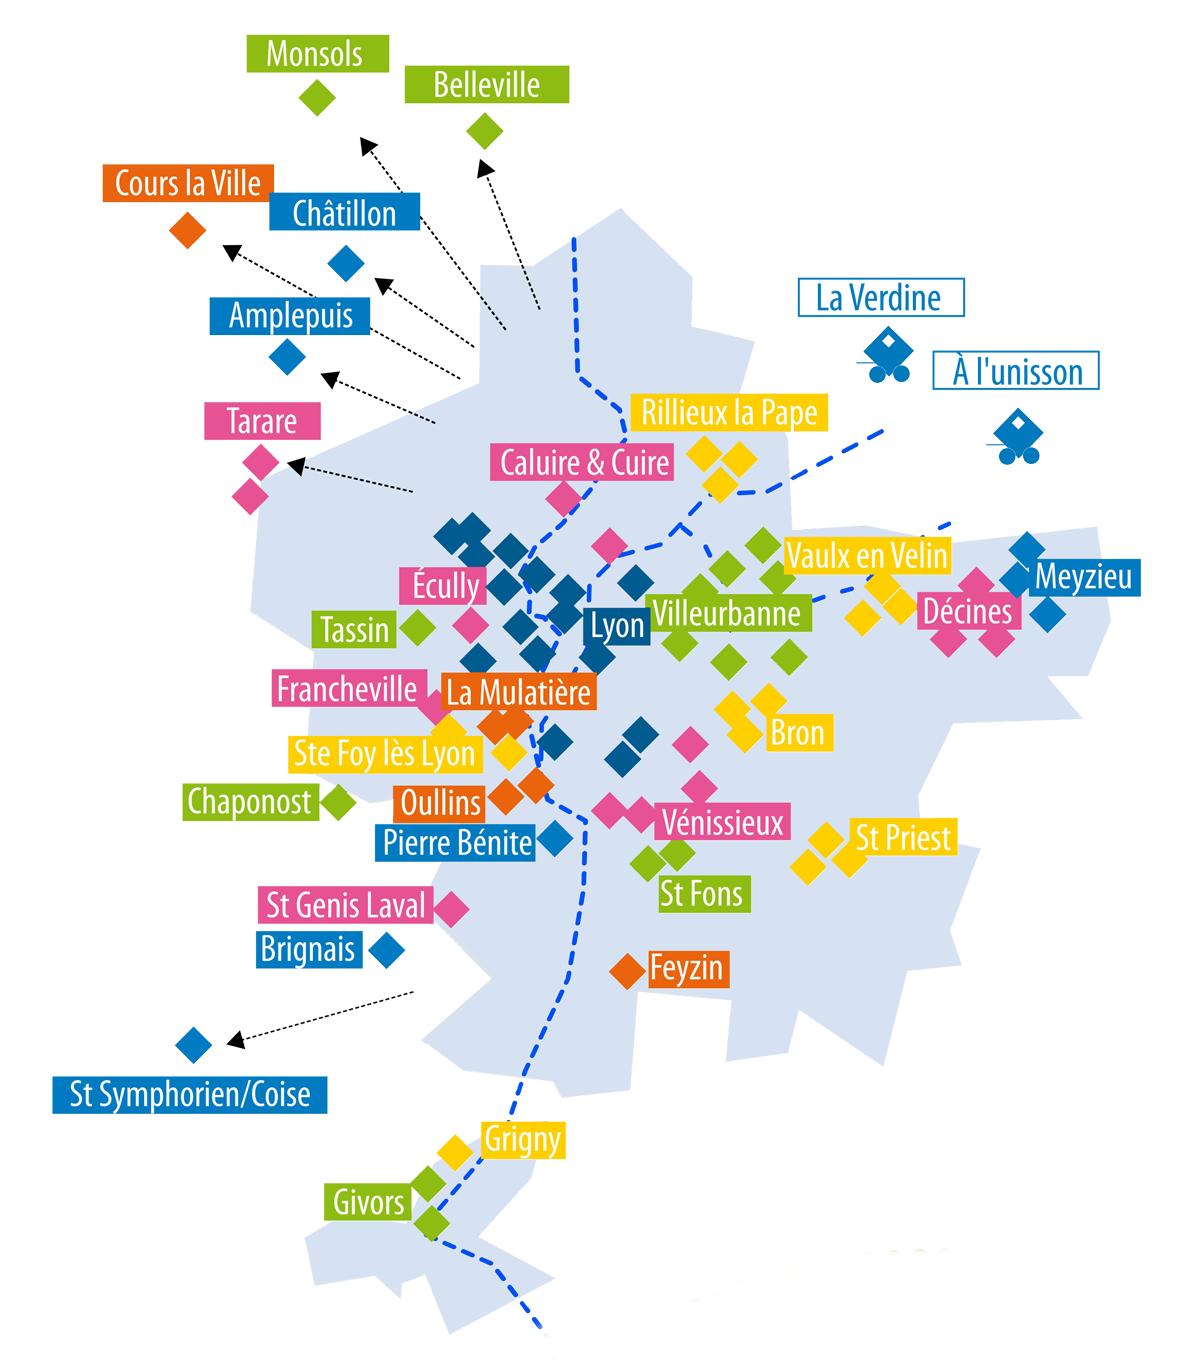 Carte centres sociaux culturels Rhône